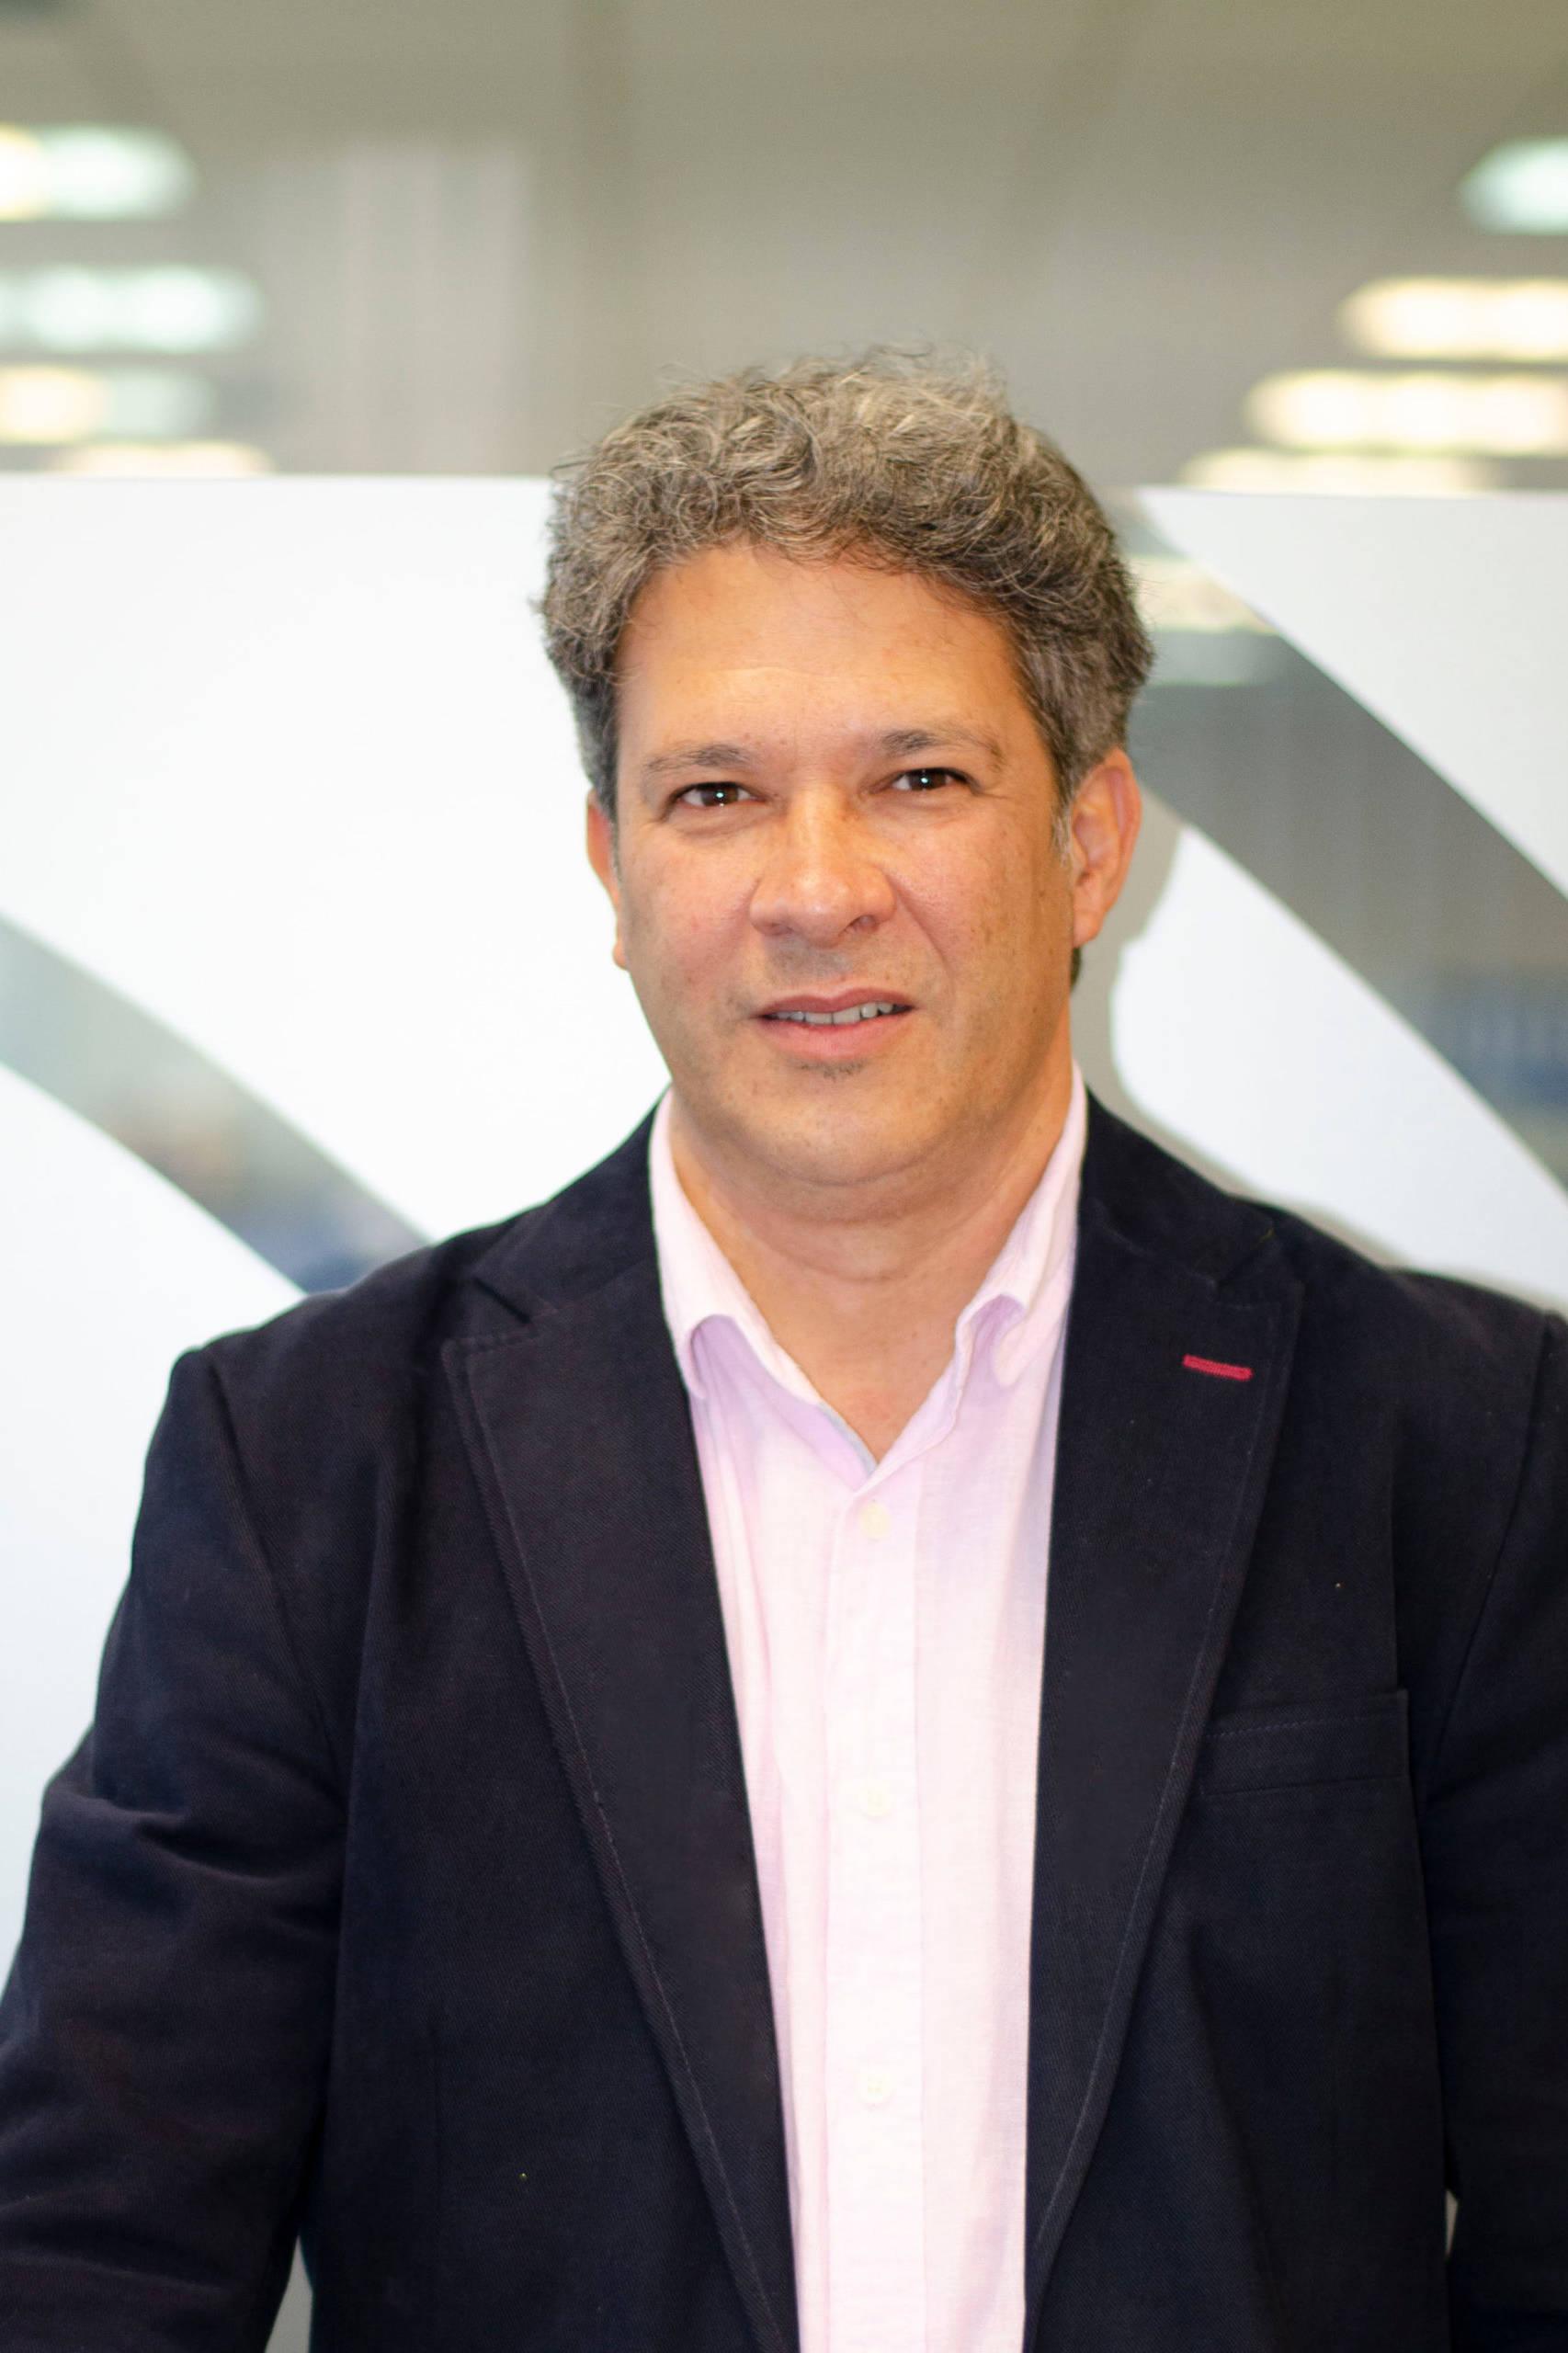 Jorge Soto Gonzalo